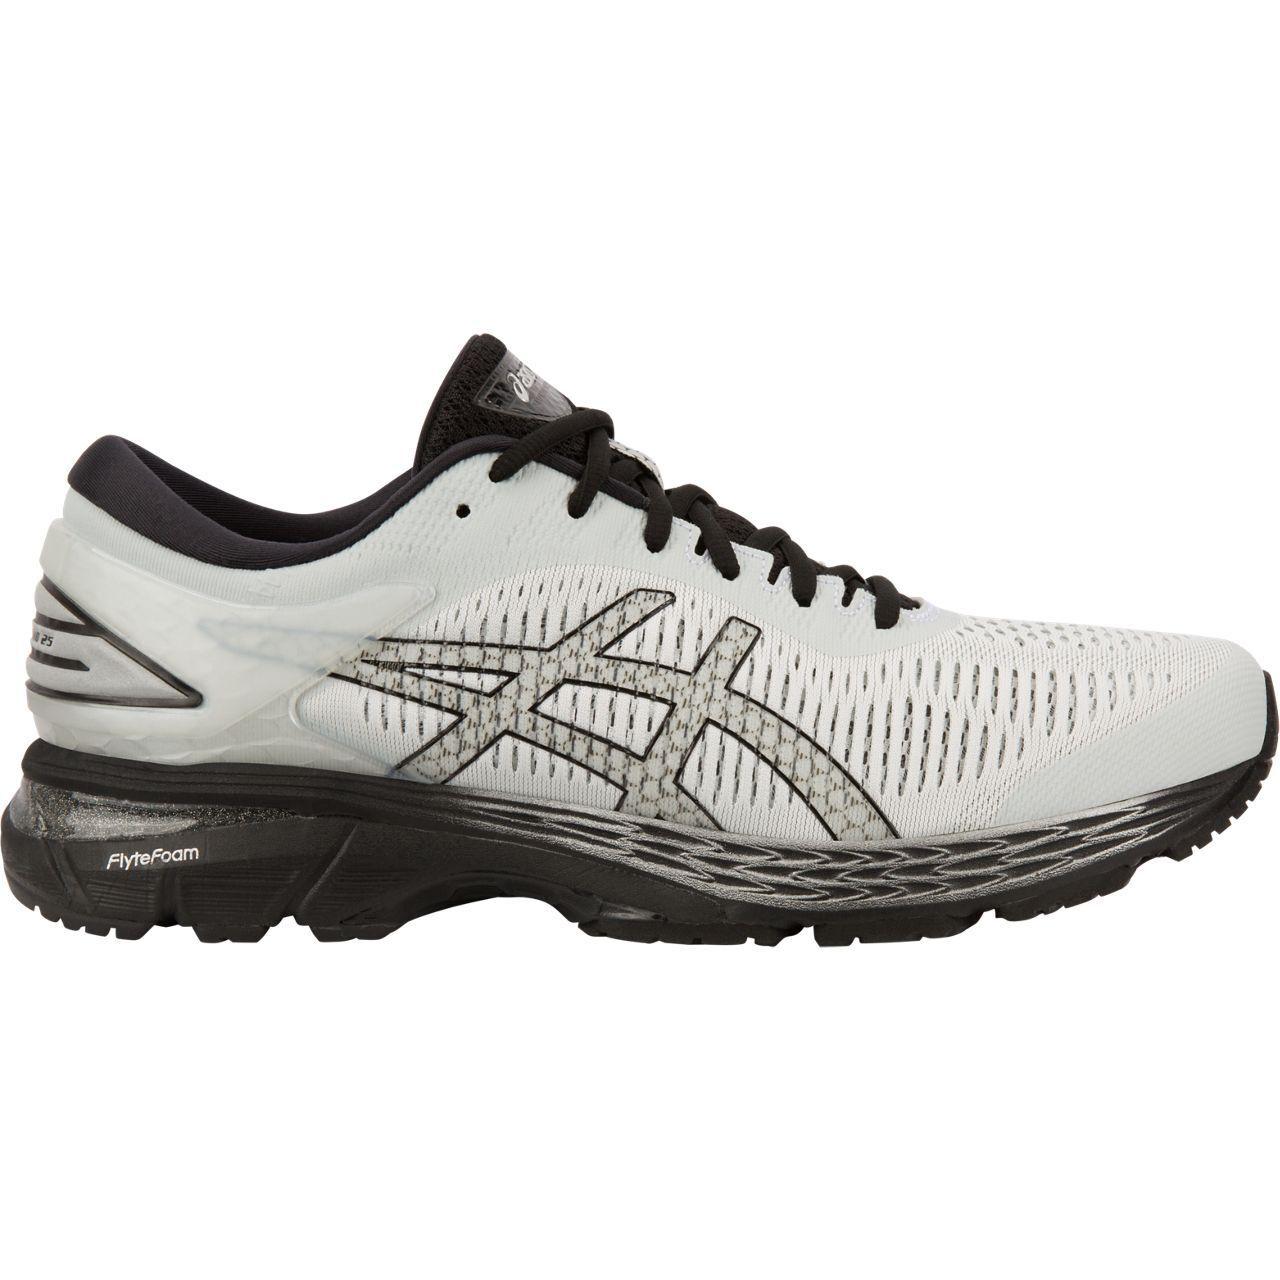 NEW Asics Gel Kayano 25 Mens Running shoes (4E) (021)